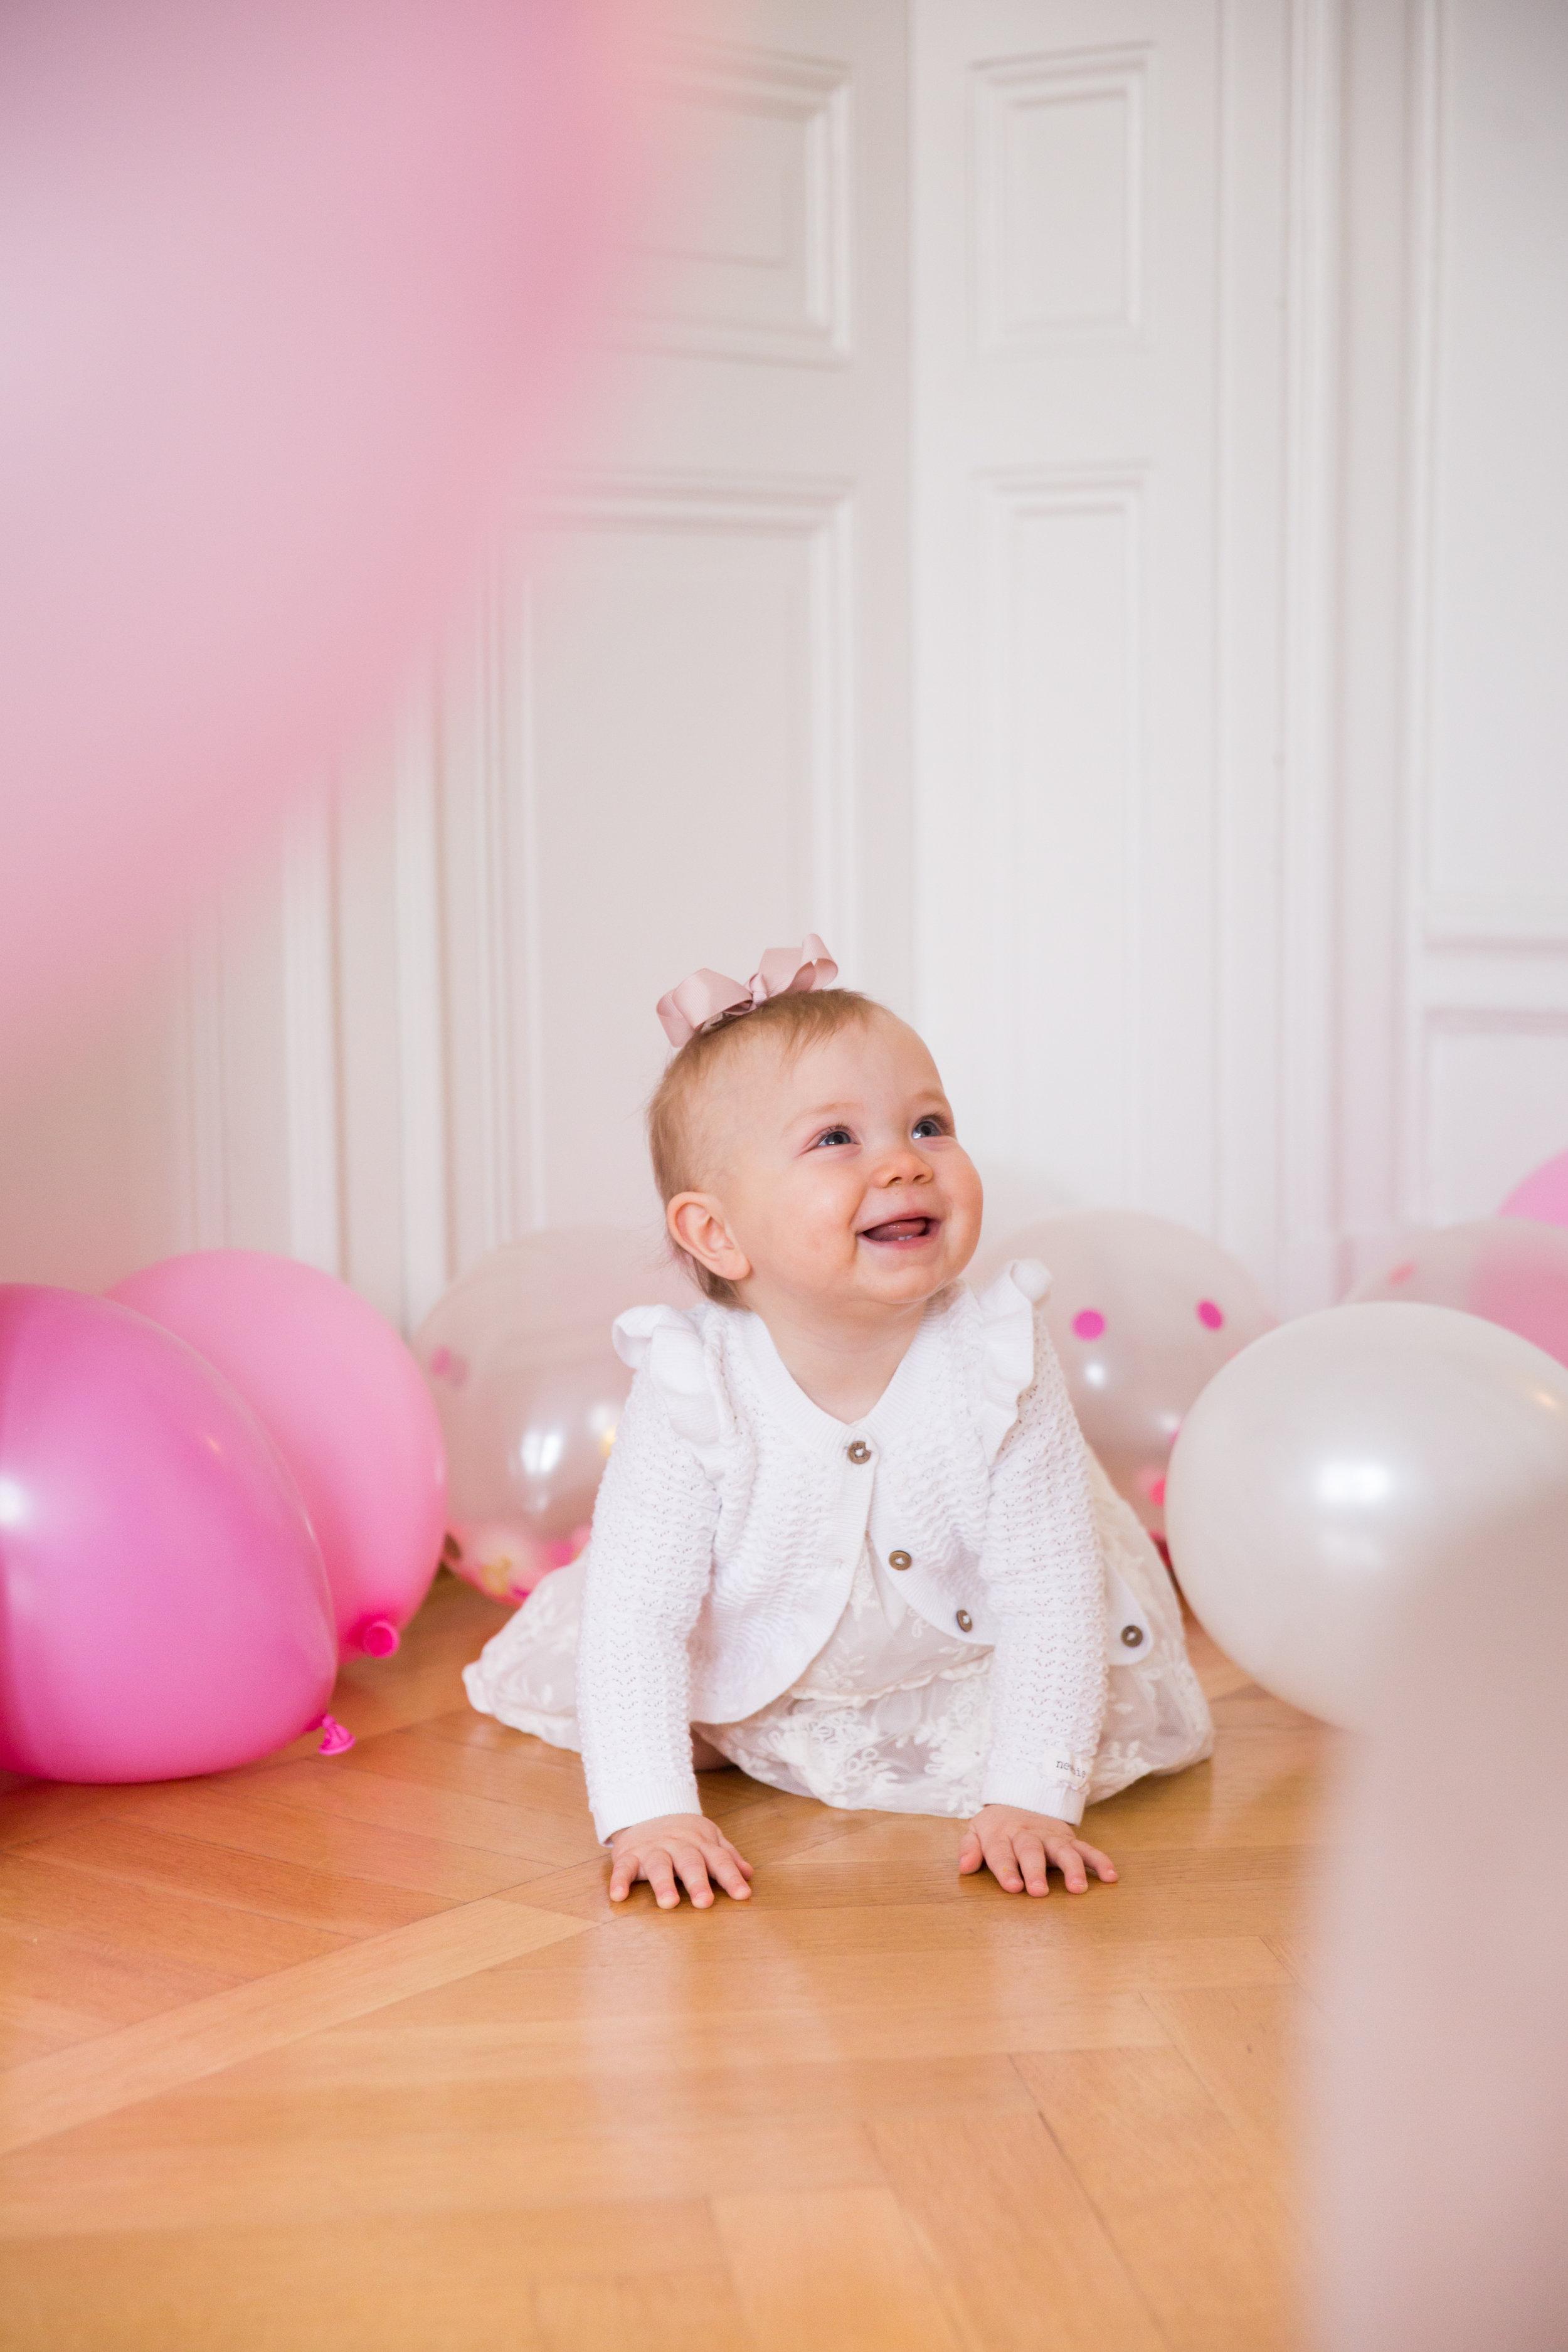 fodelsedag 1 ar bebis Angelica Aurell barn.jpg